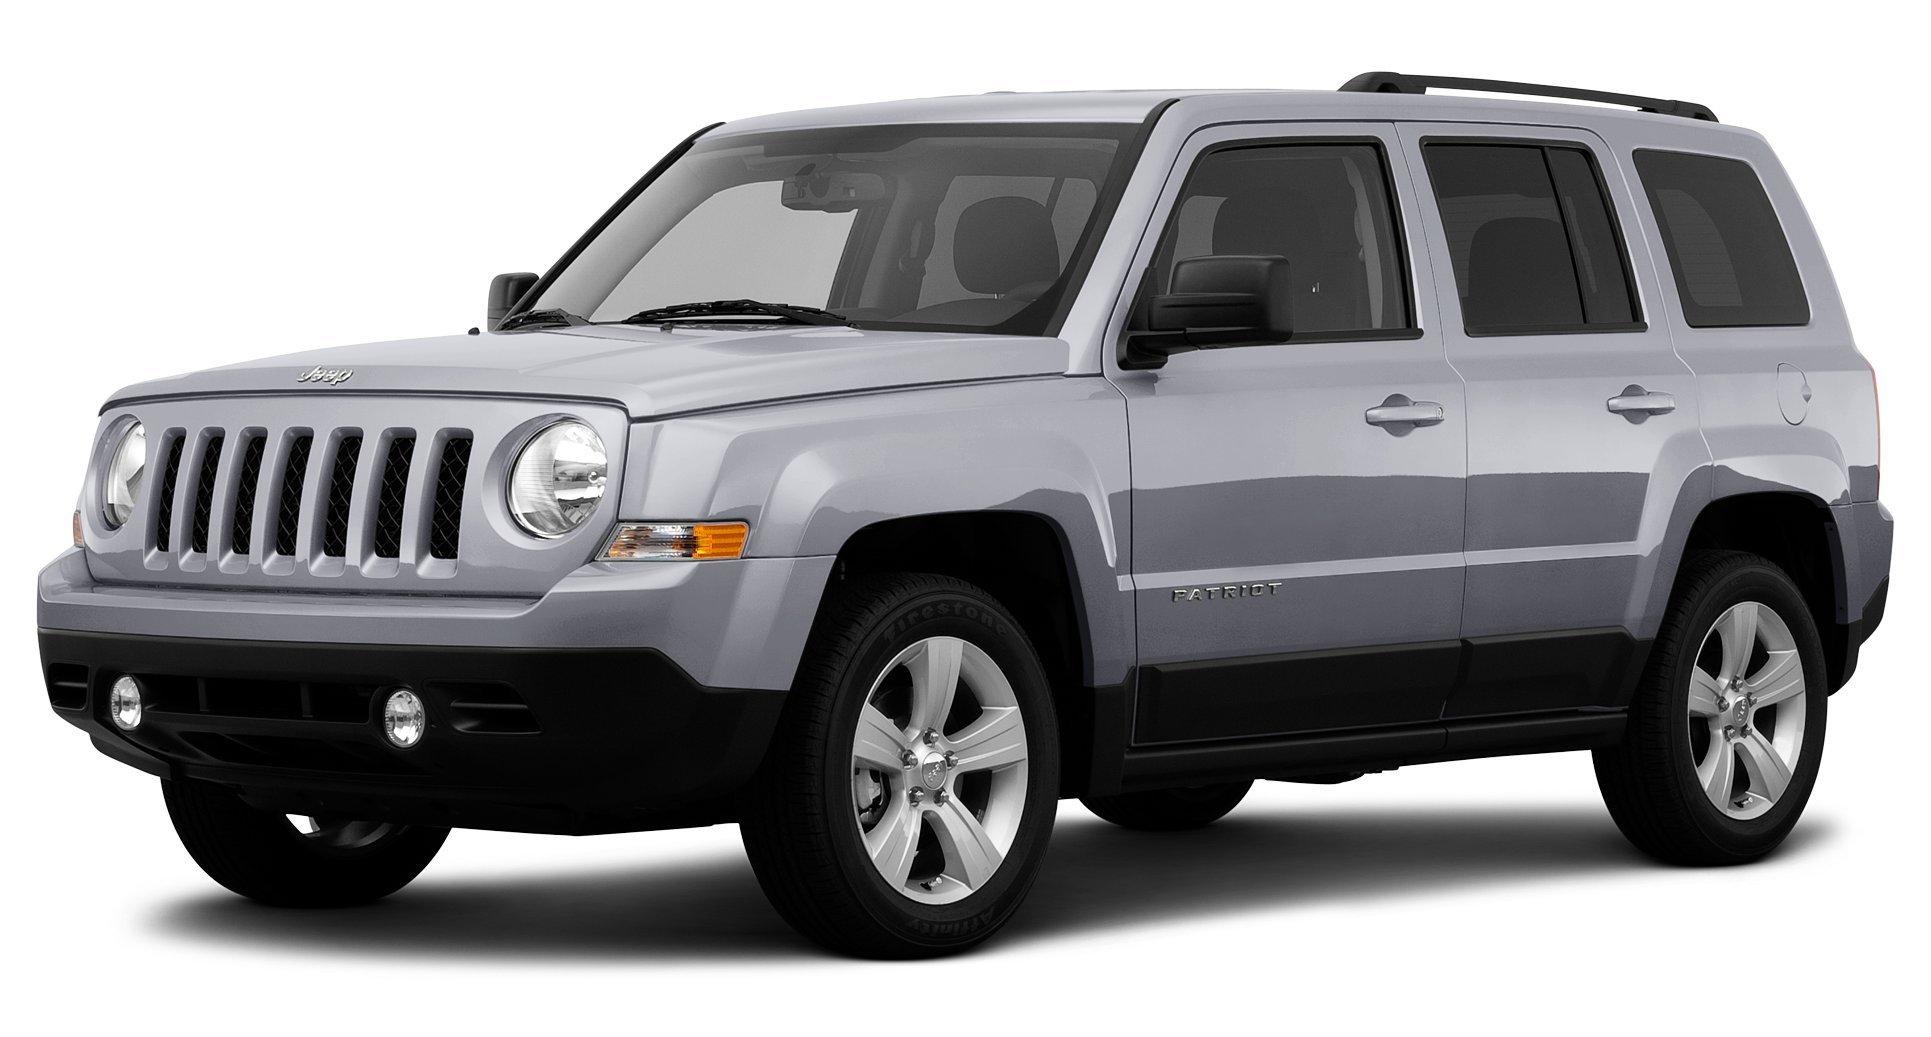 2021 Jeep Patriot Configurations